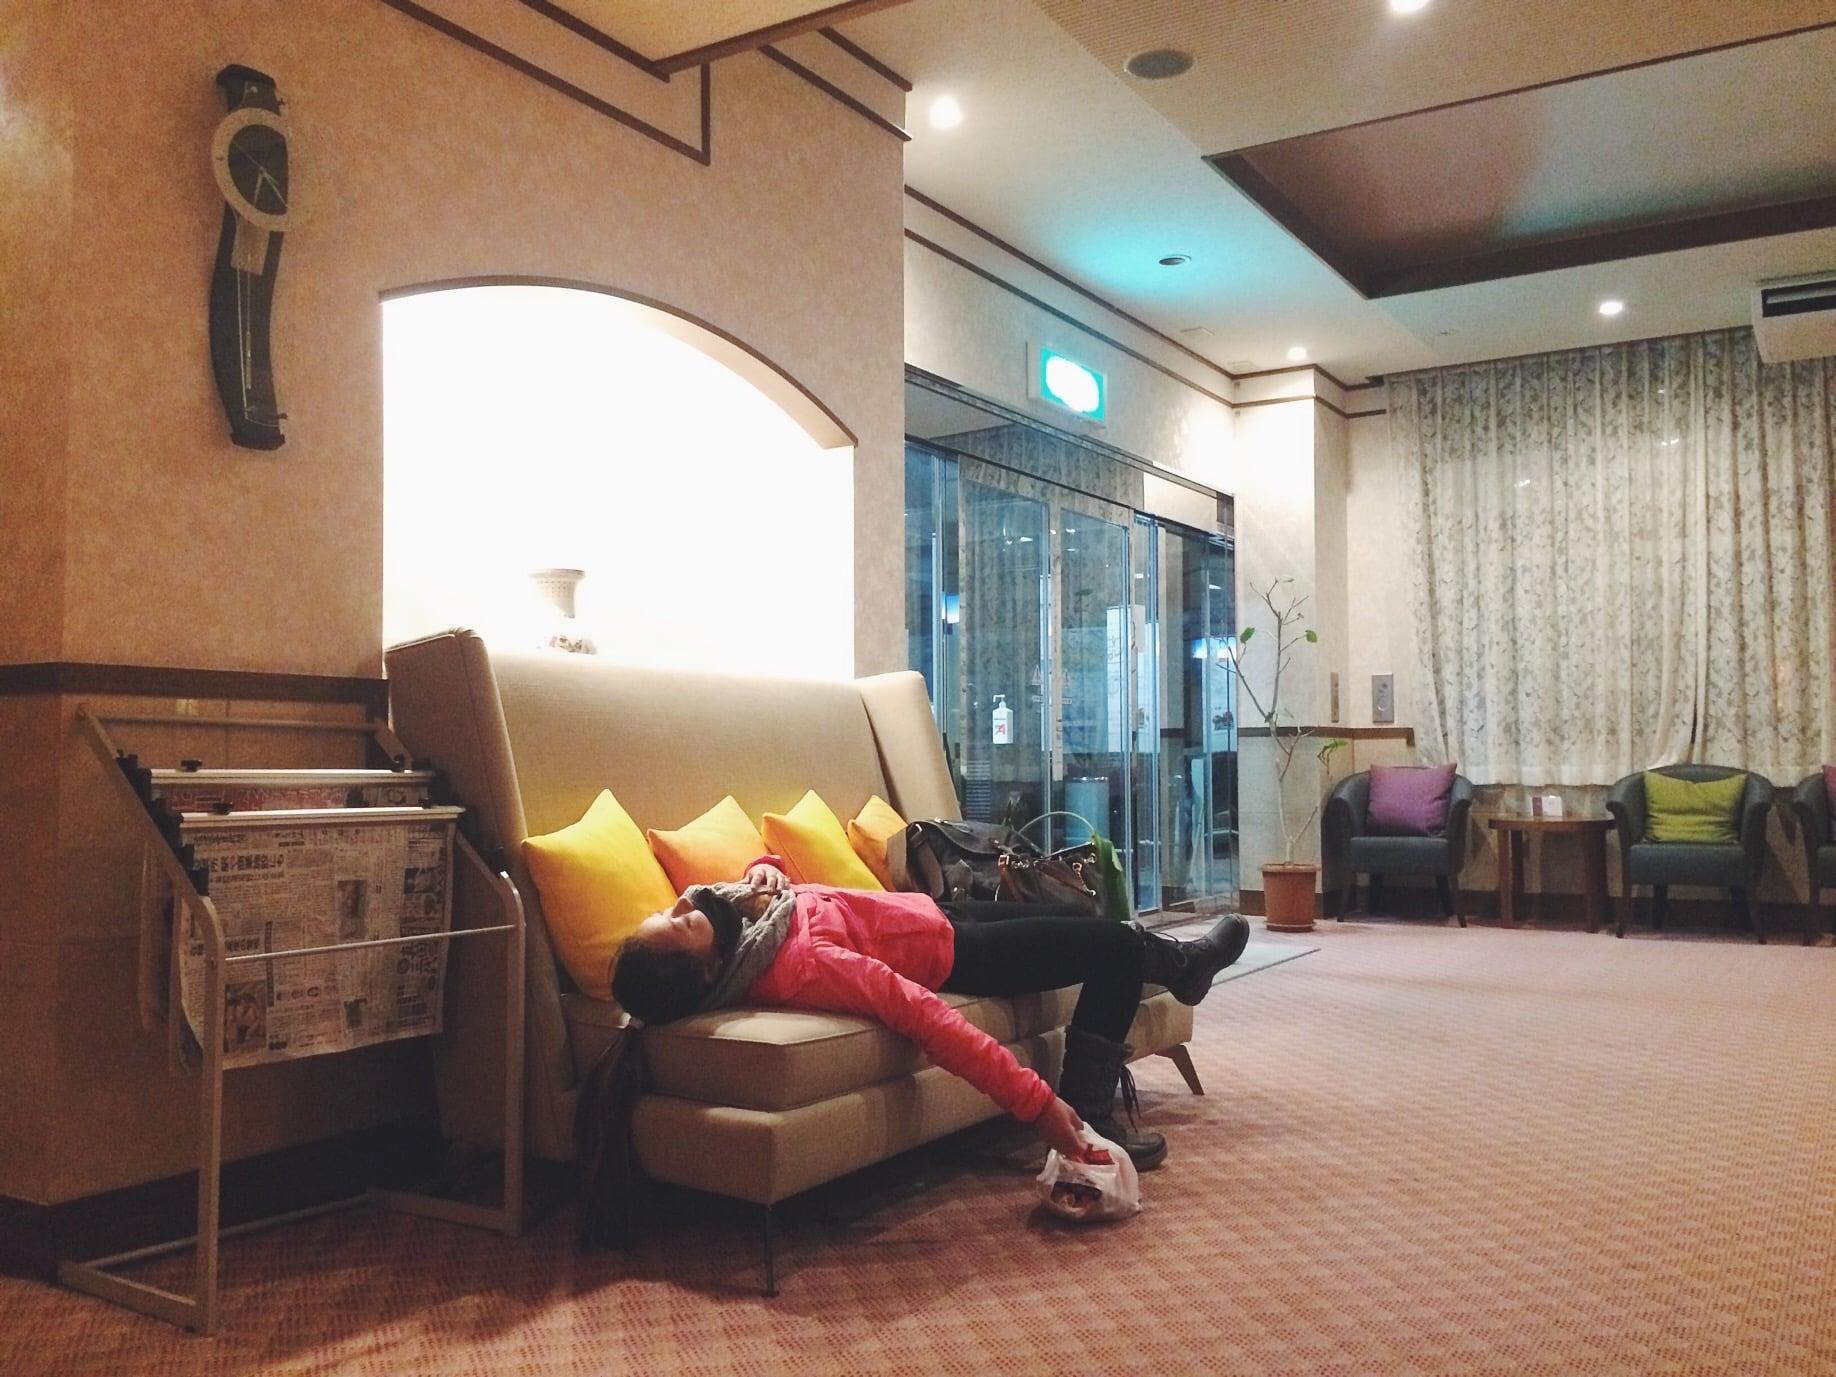 Dead, Marteena getting a few second of sleep in the Lobby since the hotel is still sleeping!